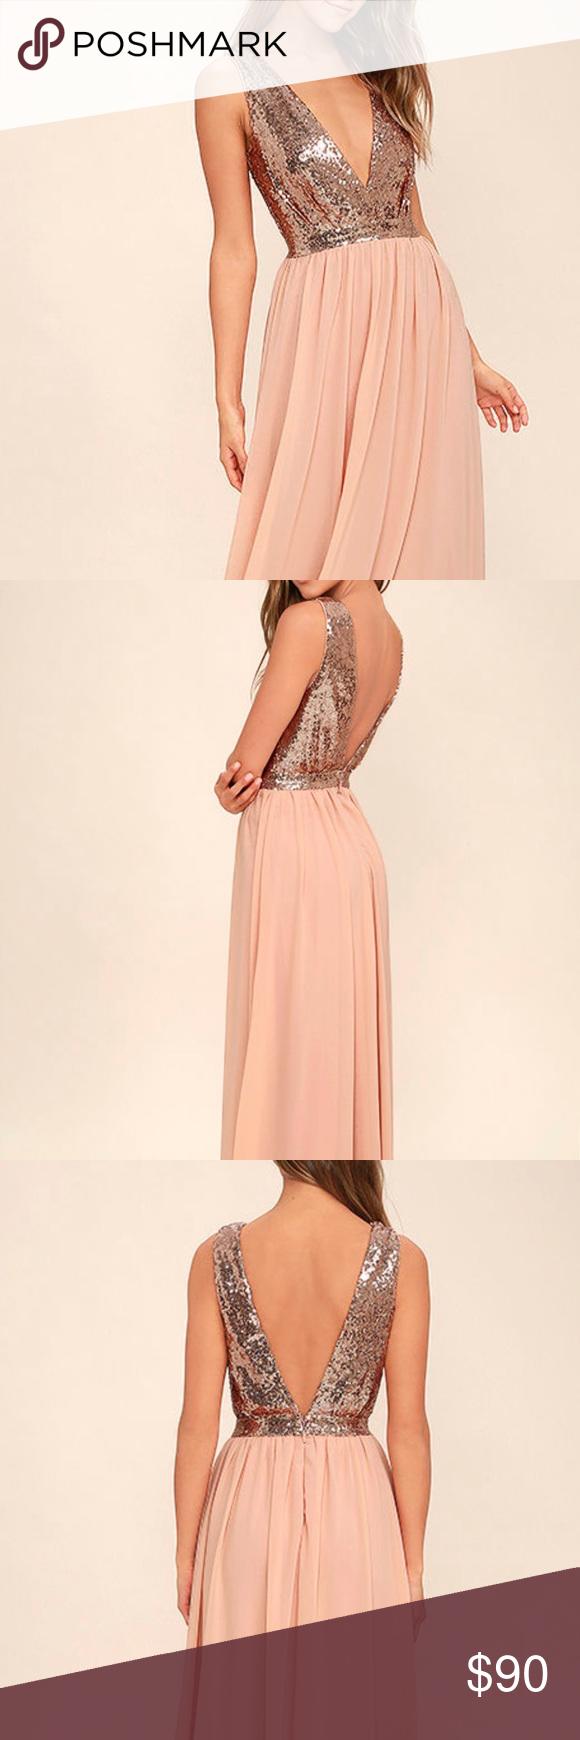 Nwt rose gold long dress nwt pinterest